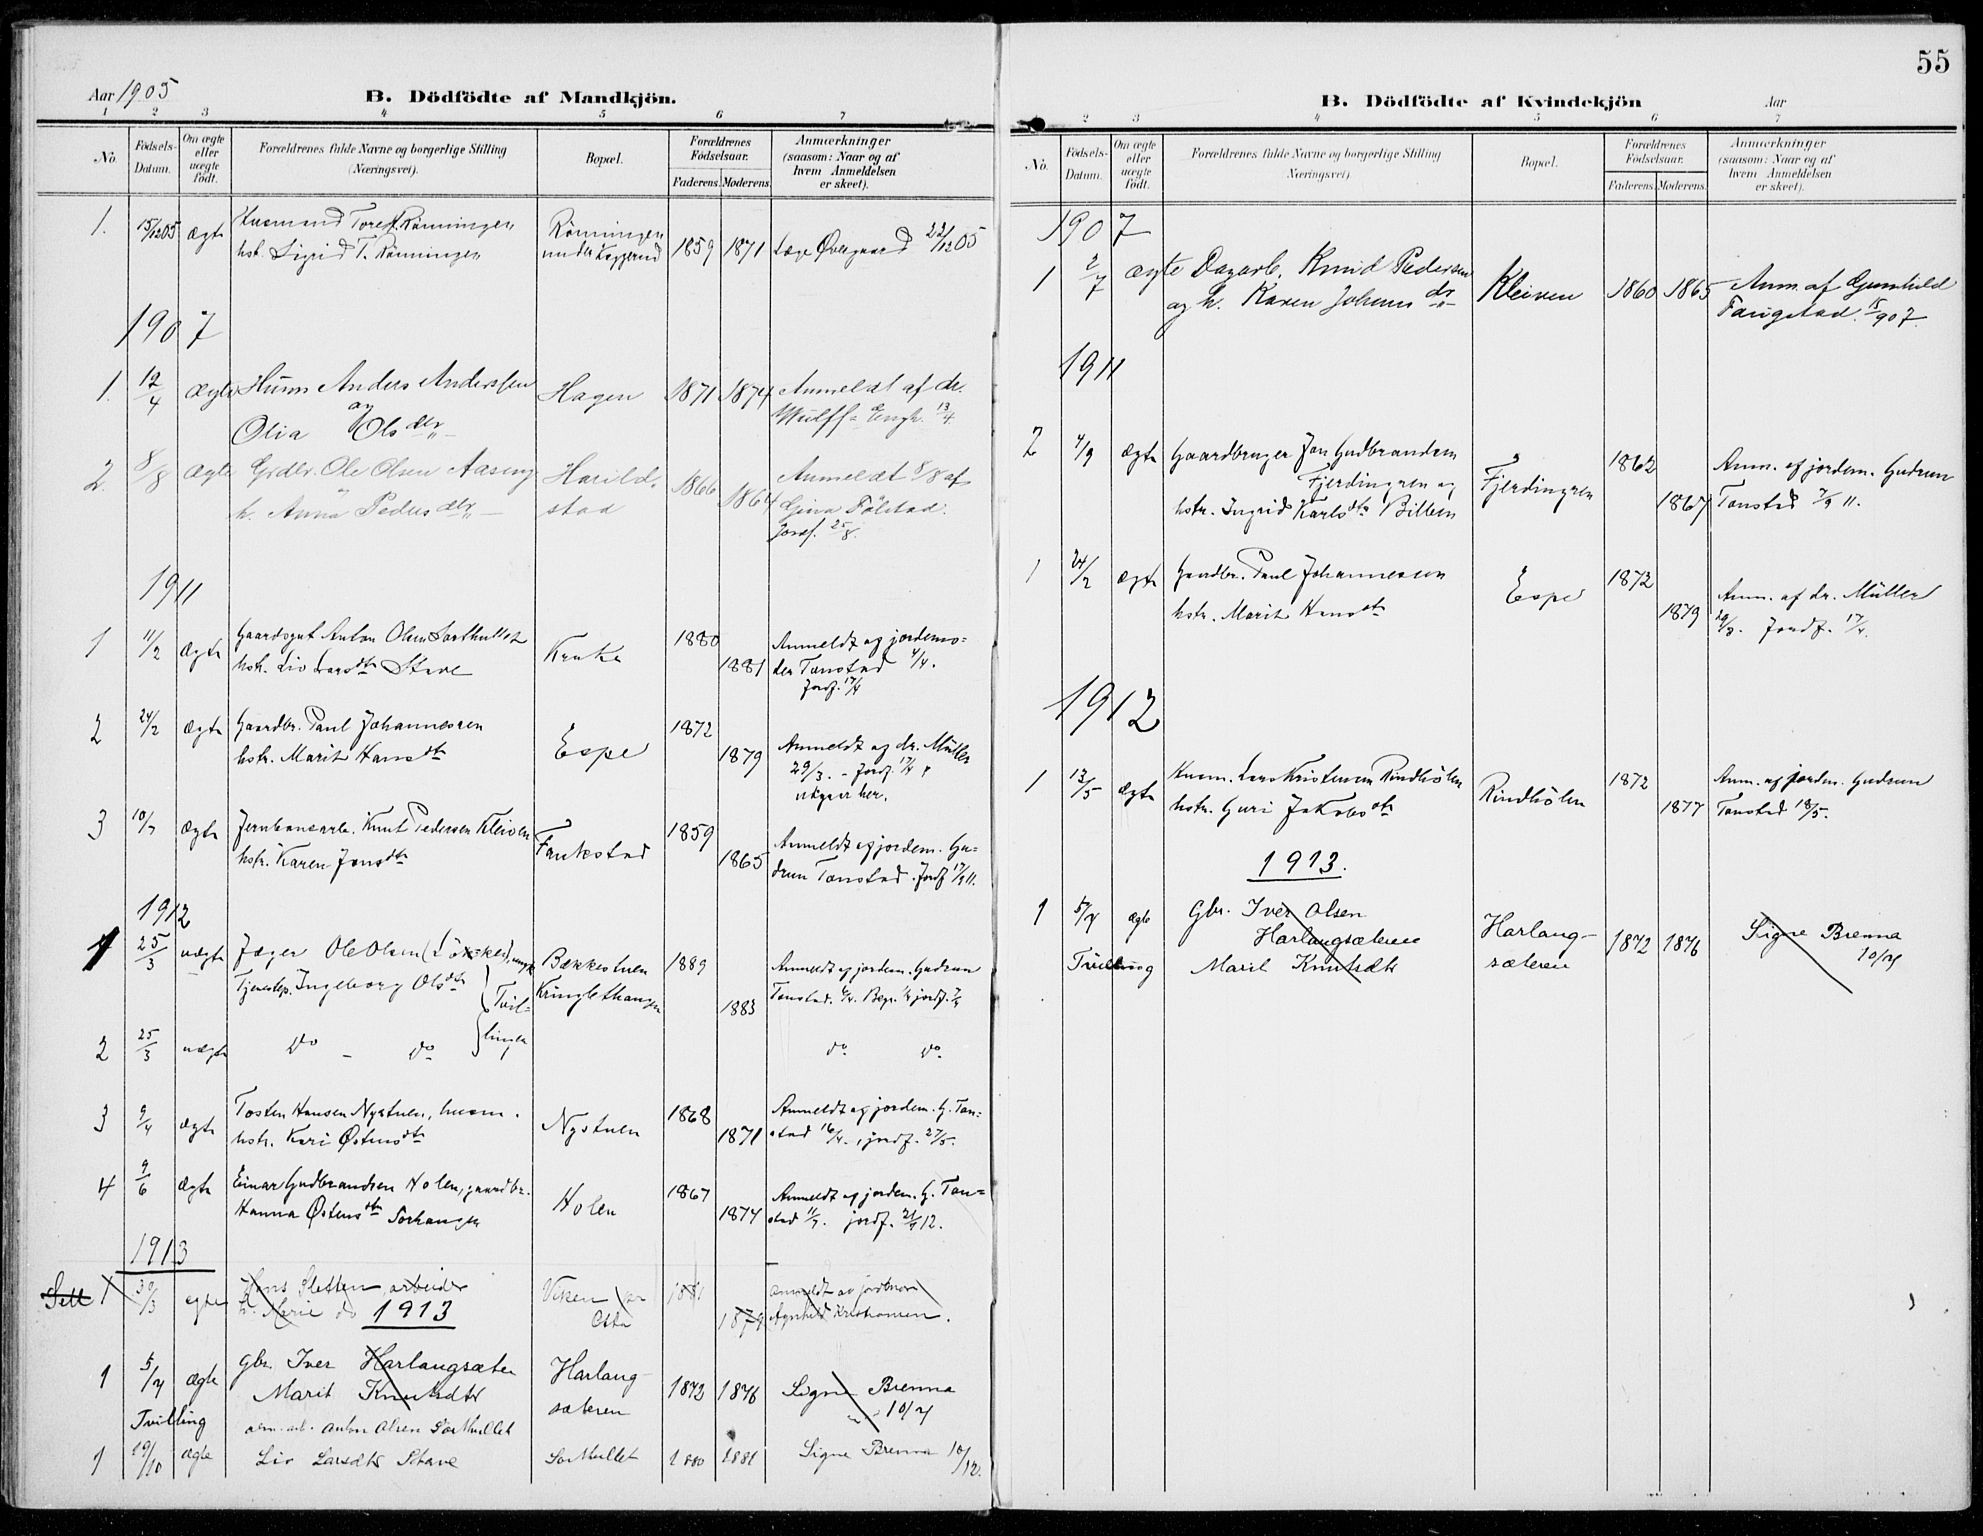 SAH, Sel prestekontor, Ministerialbok nr. 1, 1905-1922, s. 55